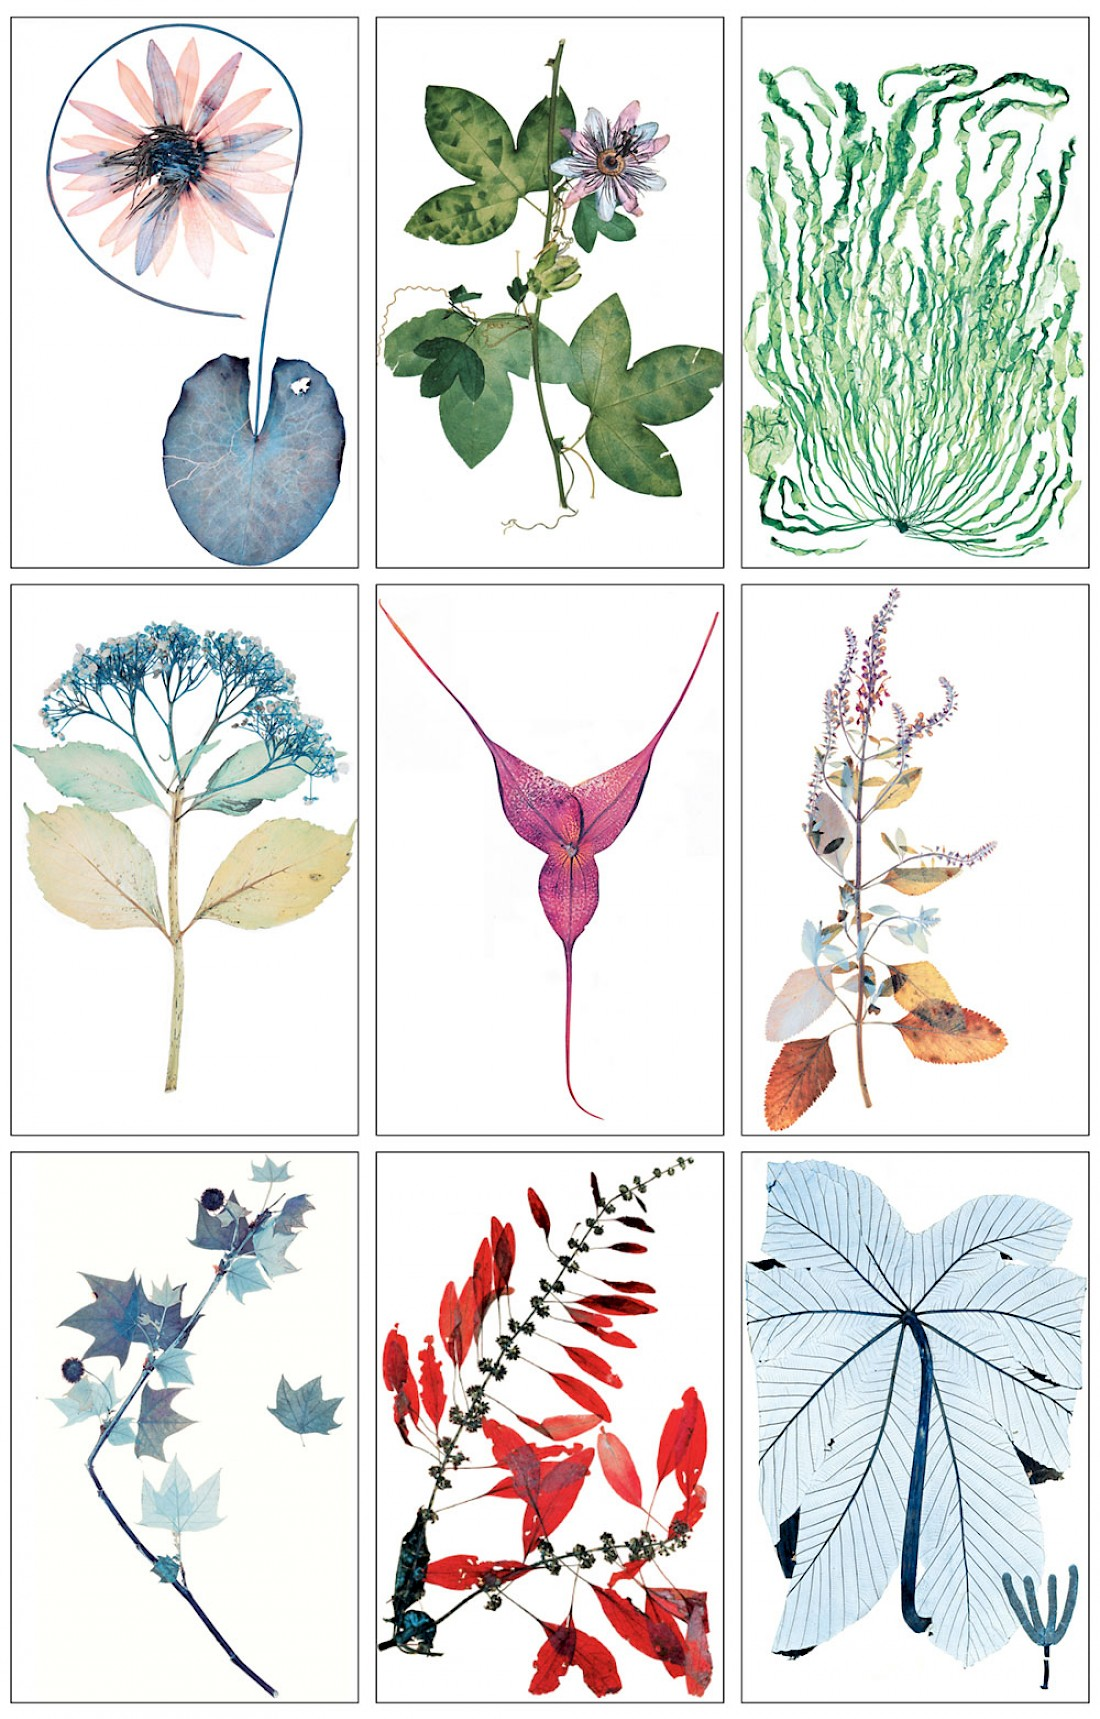 flora-grid-2-web.1100x0.jpg